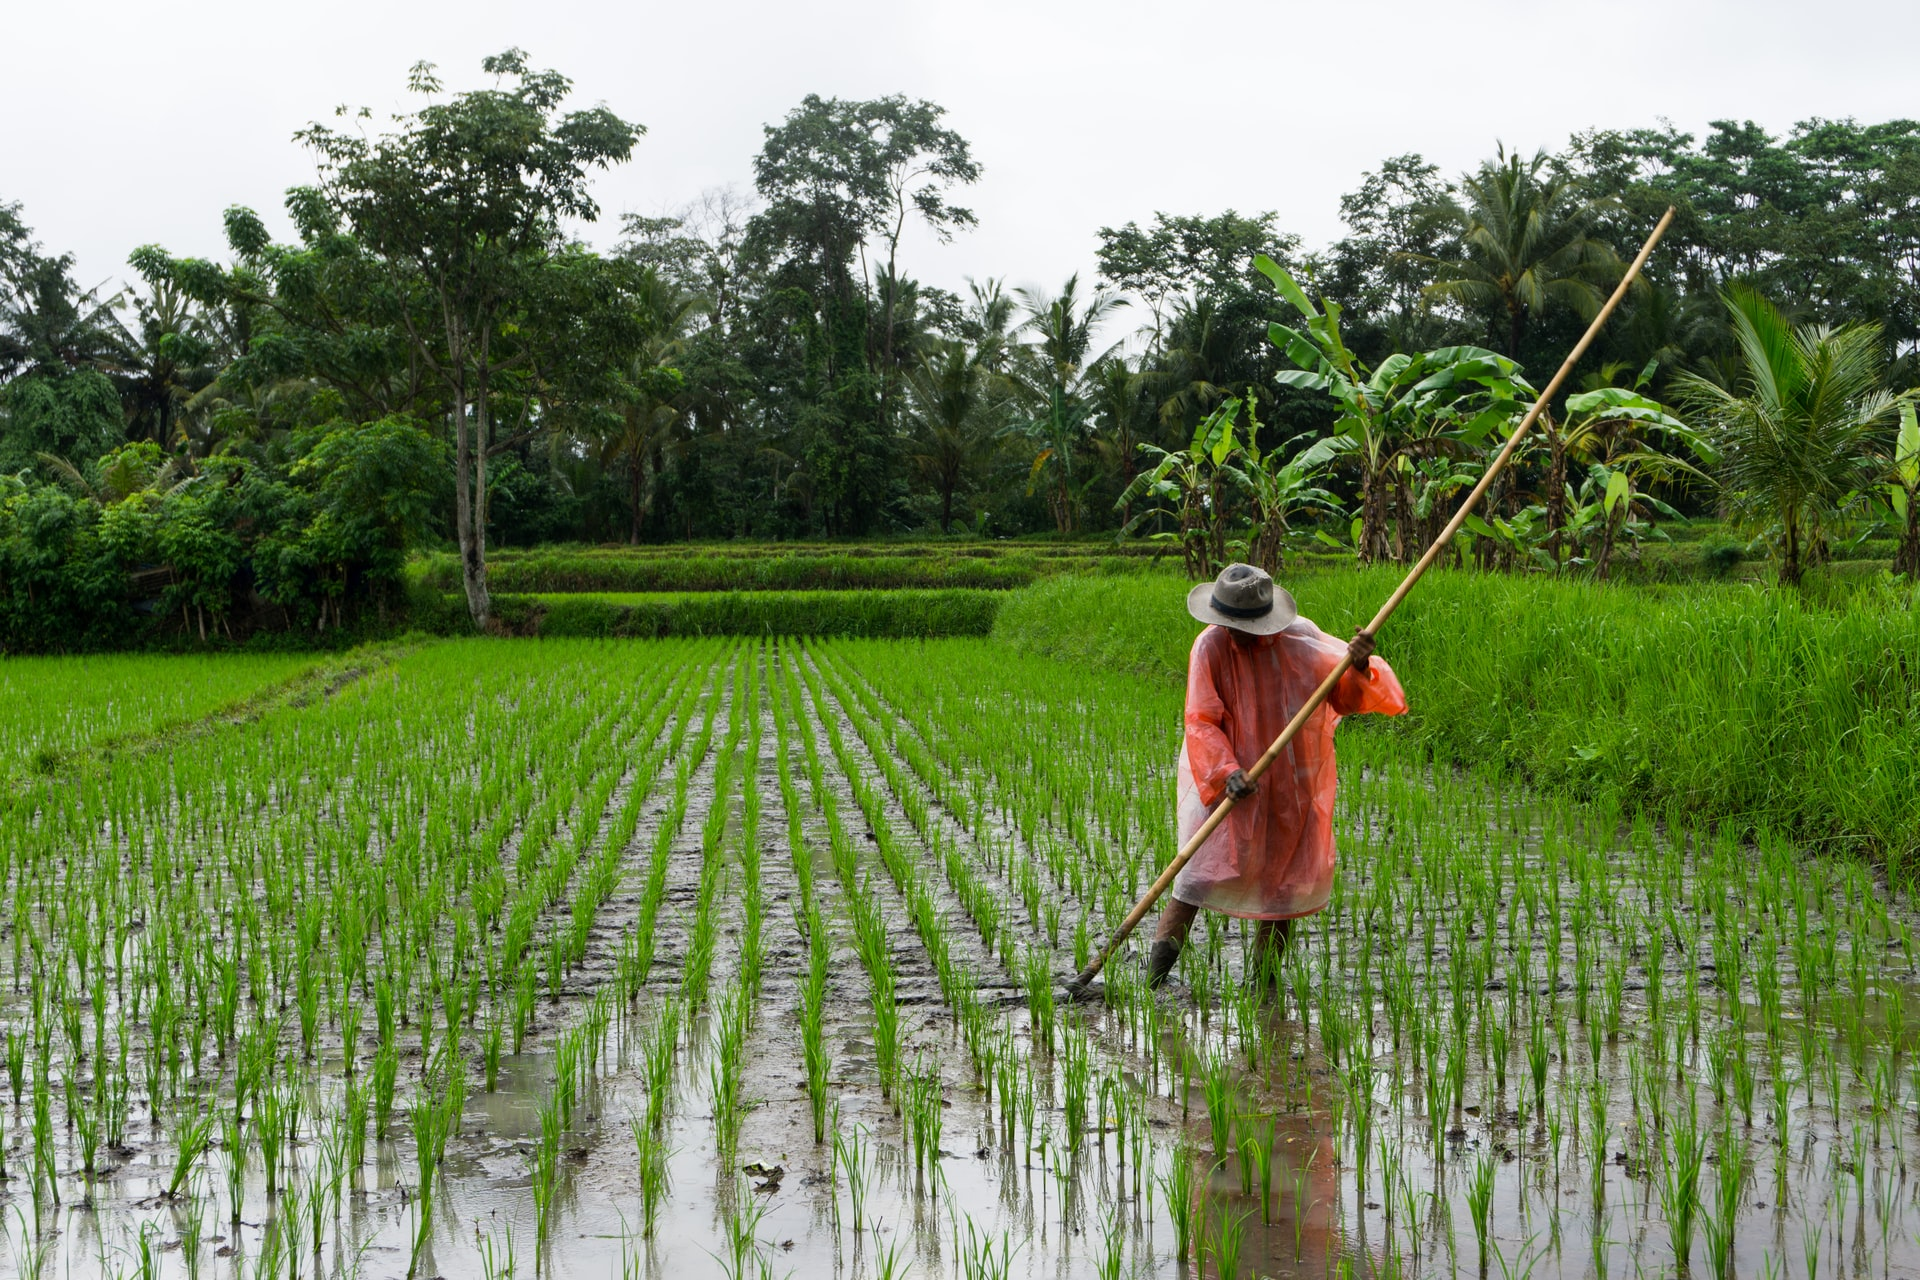 <p>Rice fields in Ubud, Indonesia. Photo by Simon Fanger/Unsplash</p>